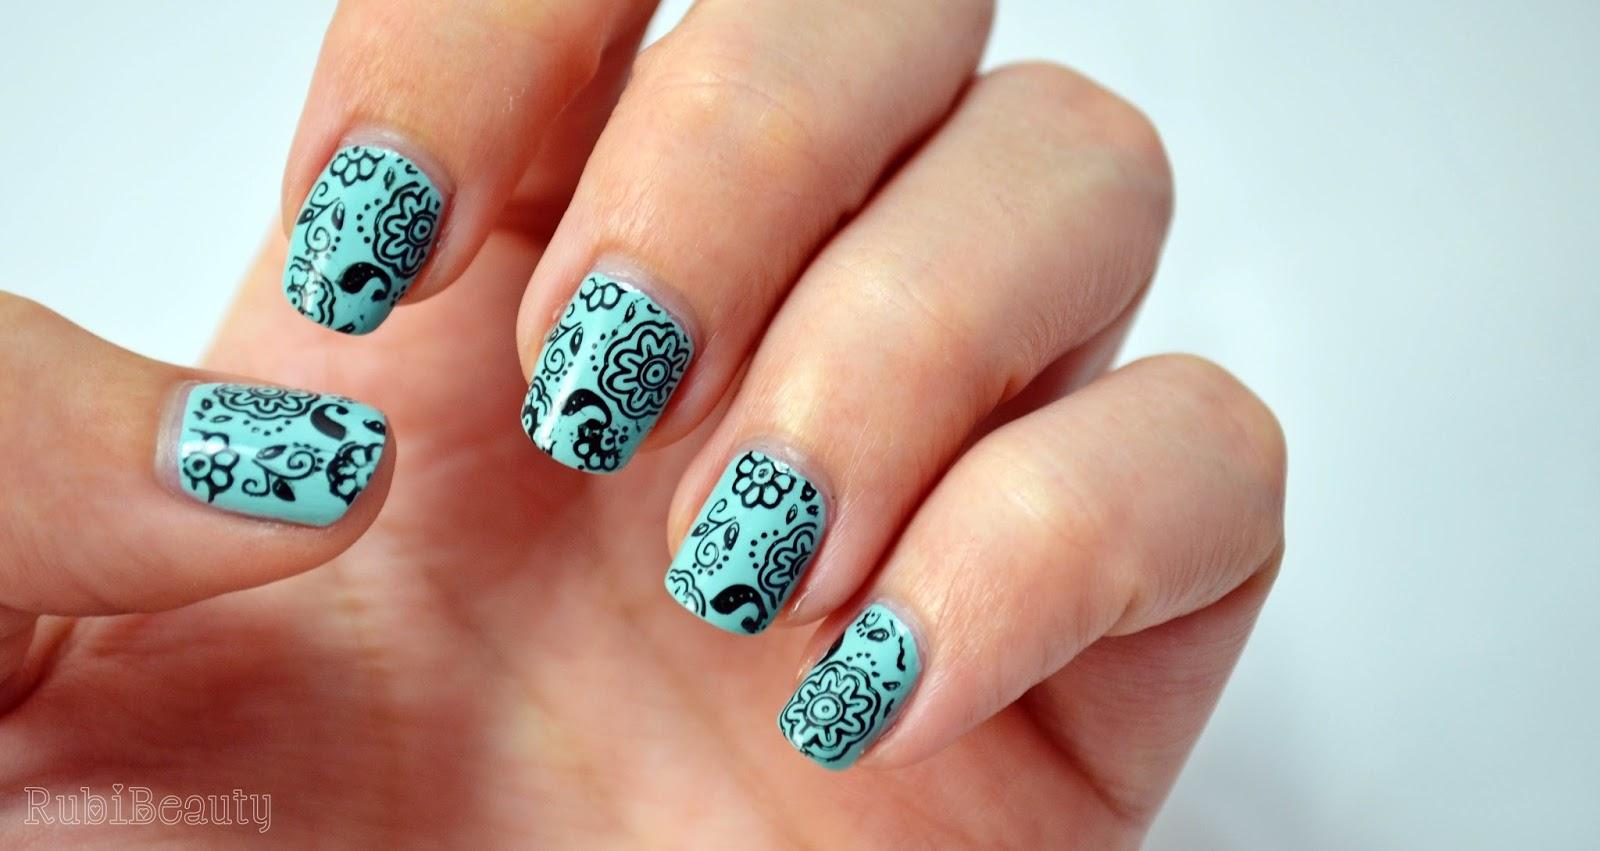 rubibeauty nail art manicura floral estampacion buyincoins